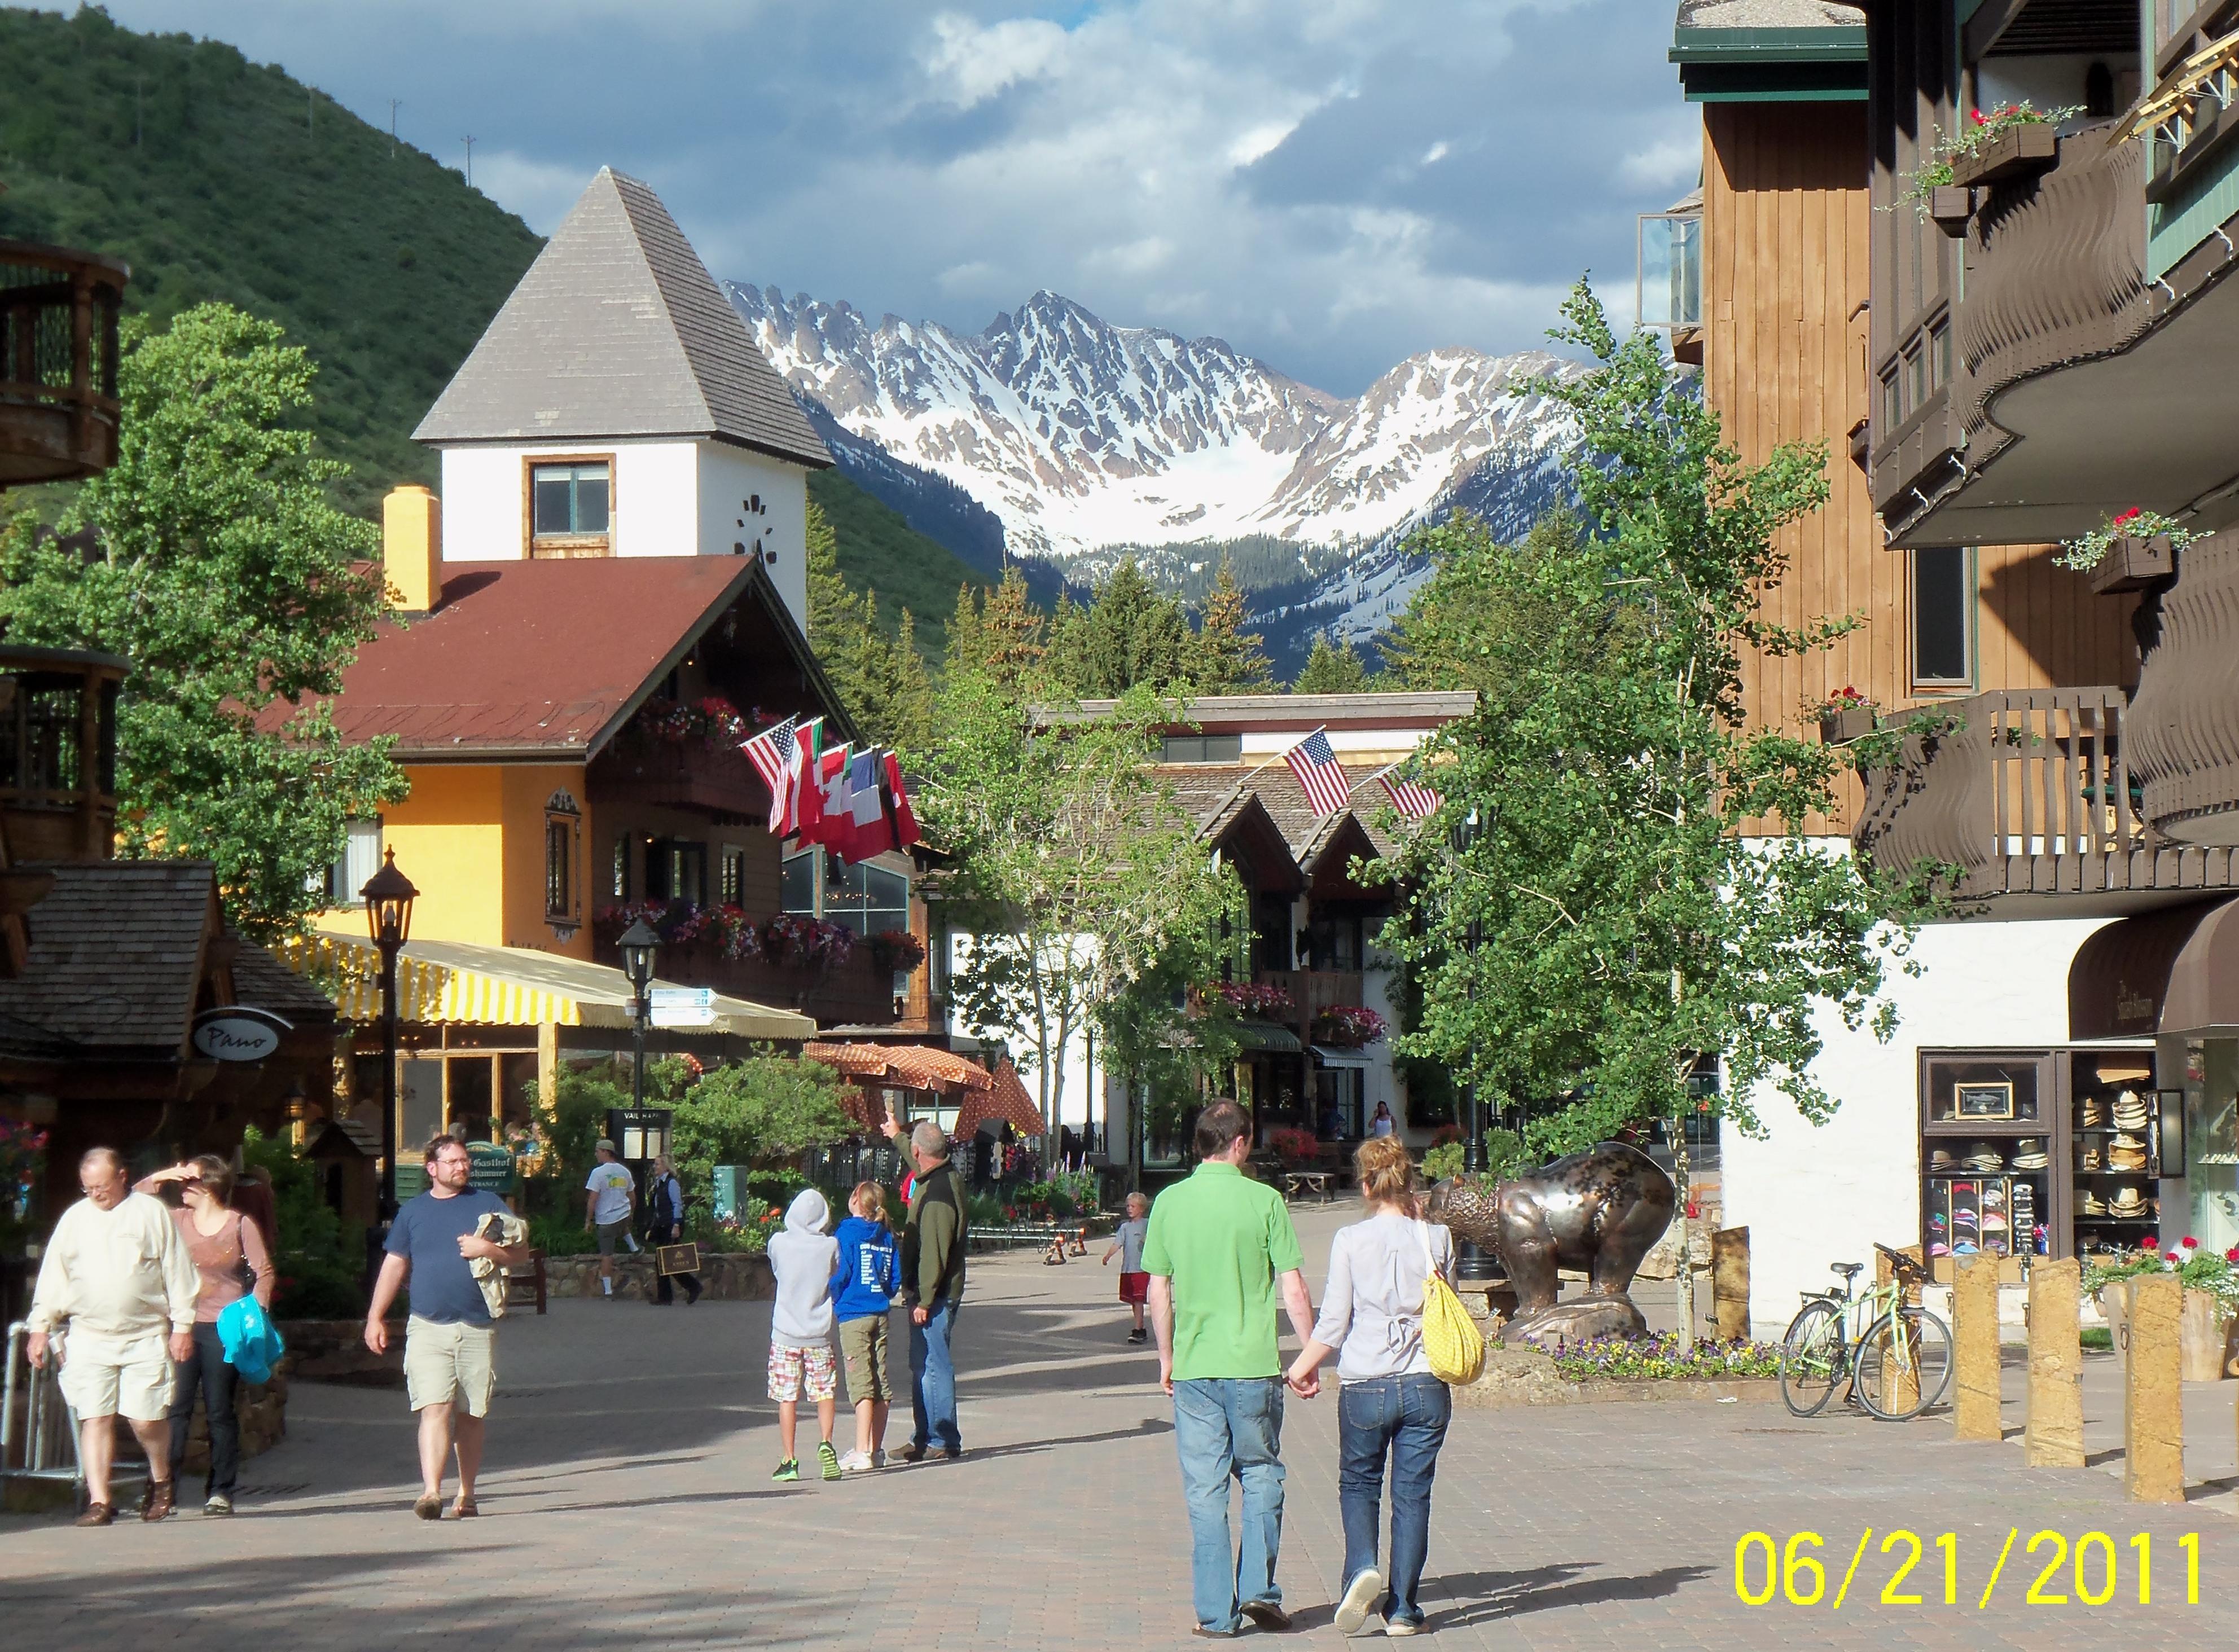 Eagle County Colorado Property Tax